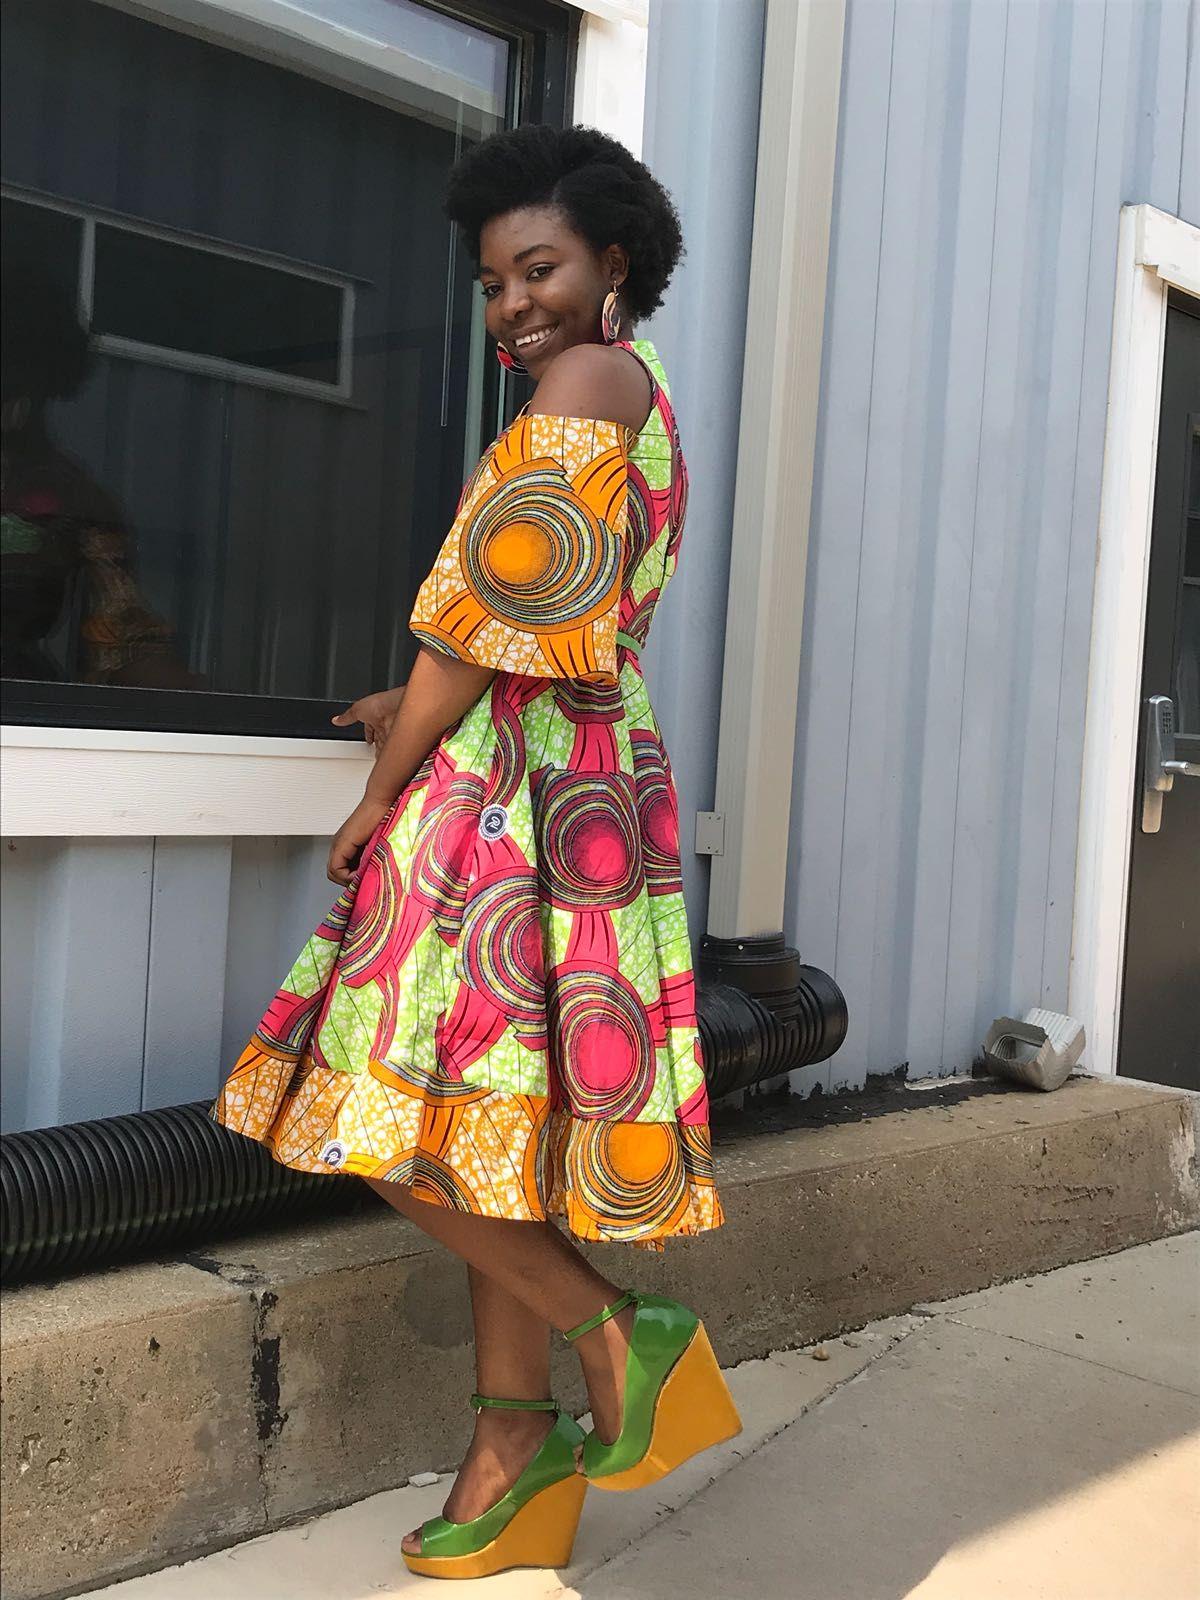 Pin by edo scribes u pleasantries on africana design aesthetics in